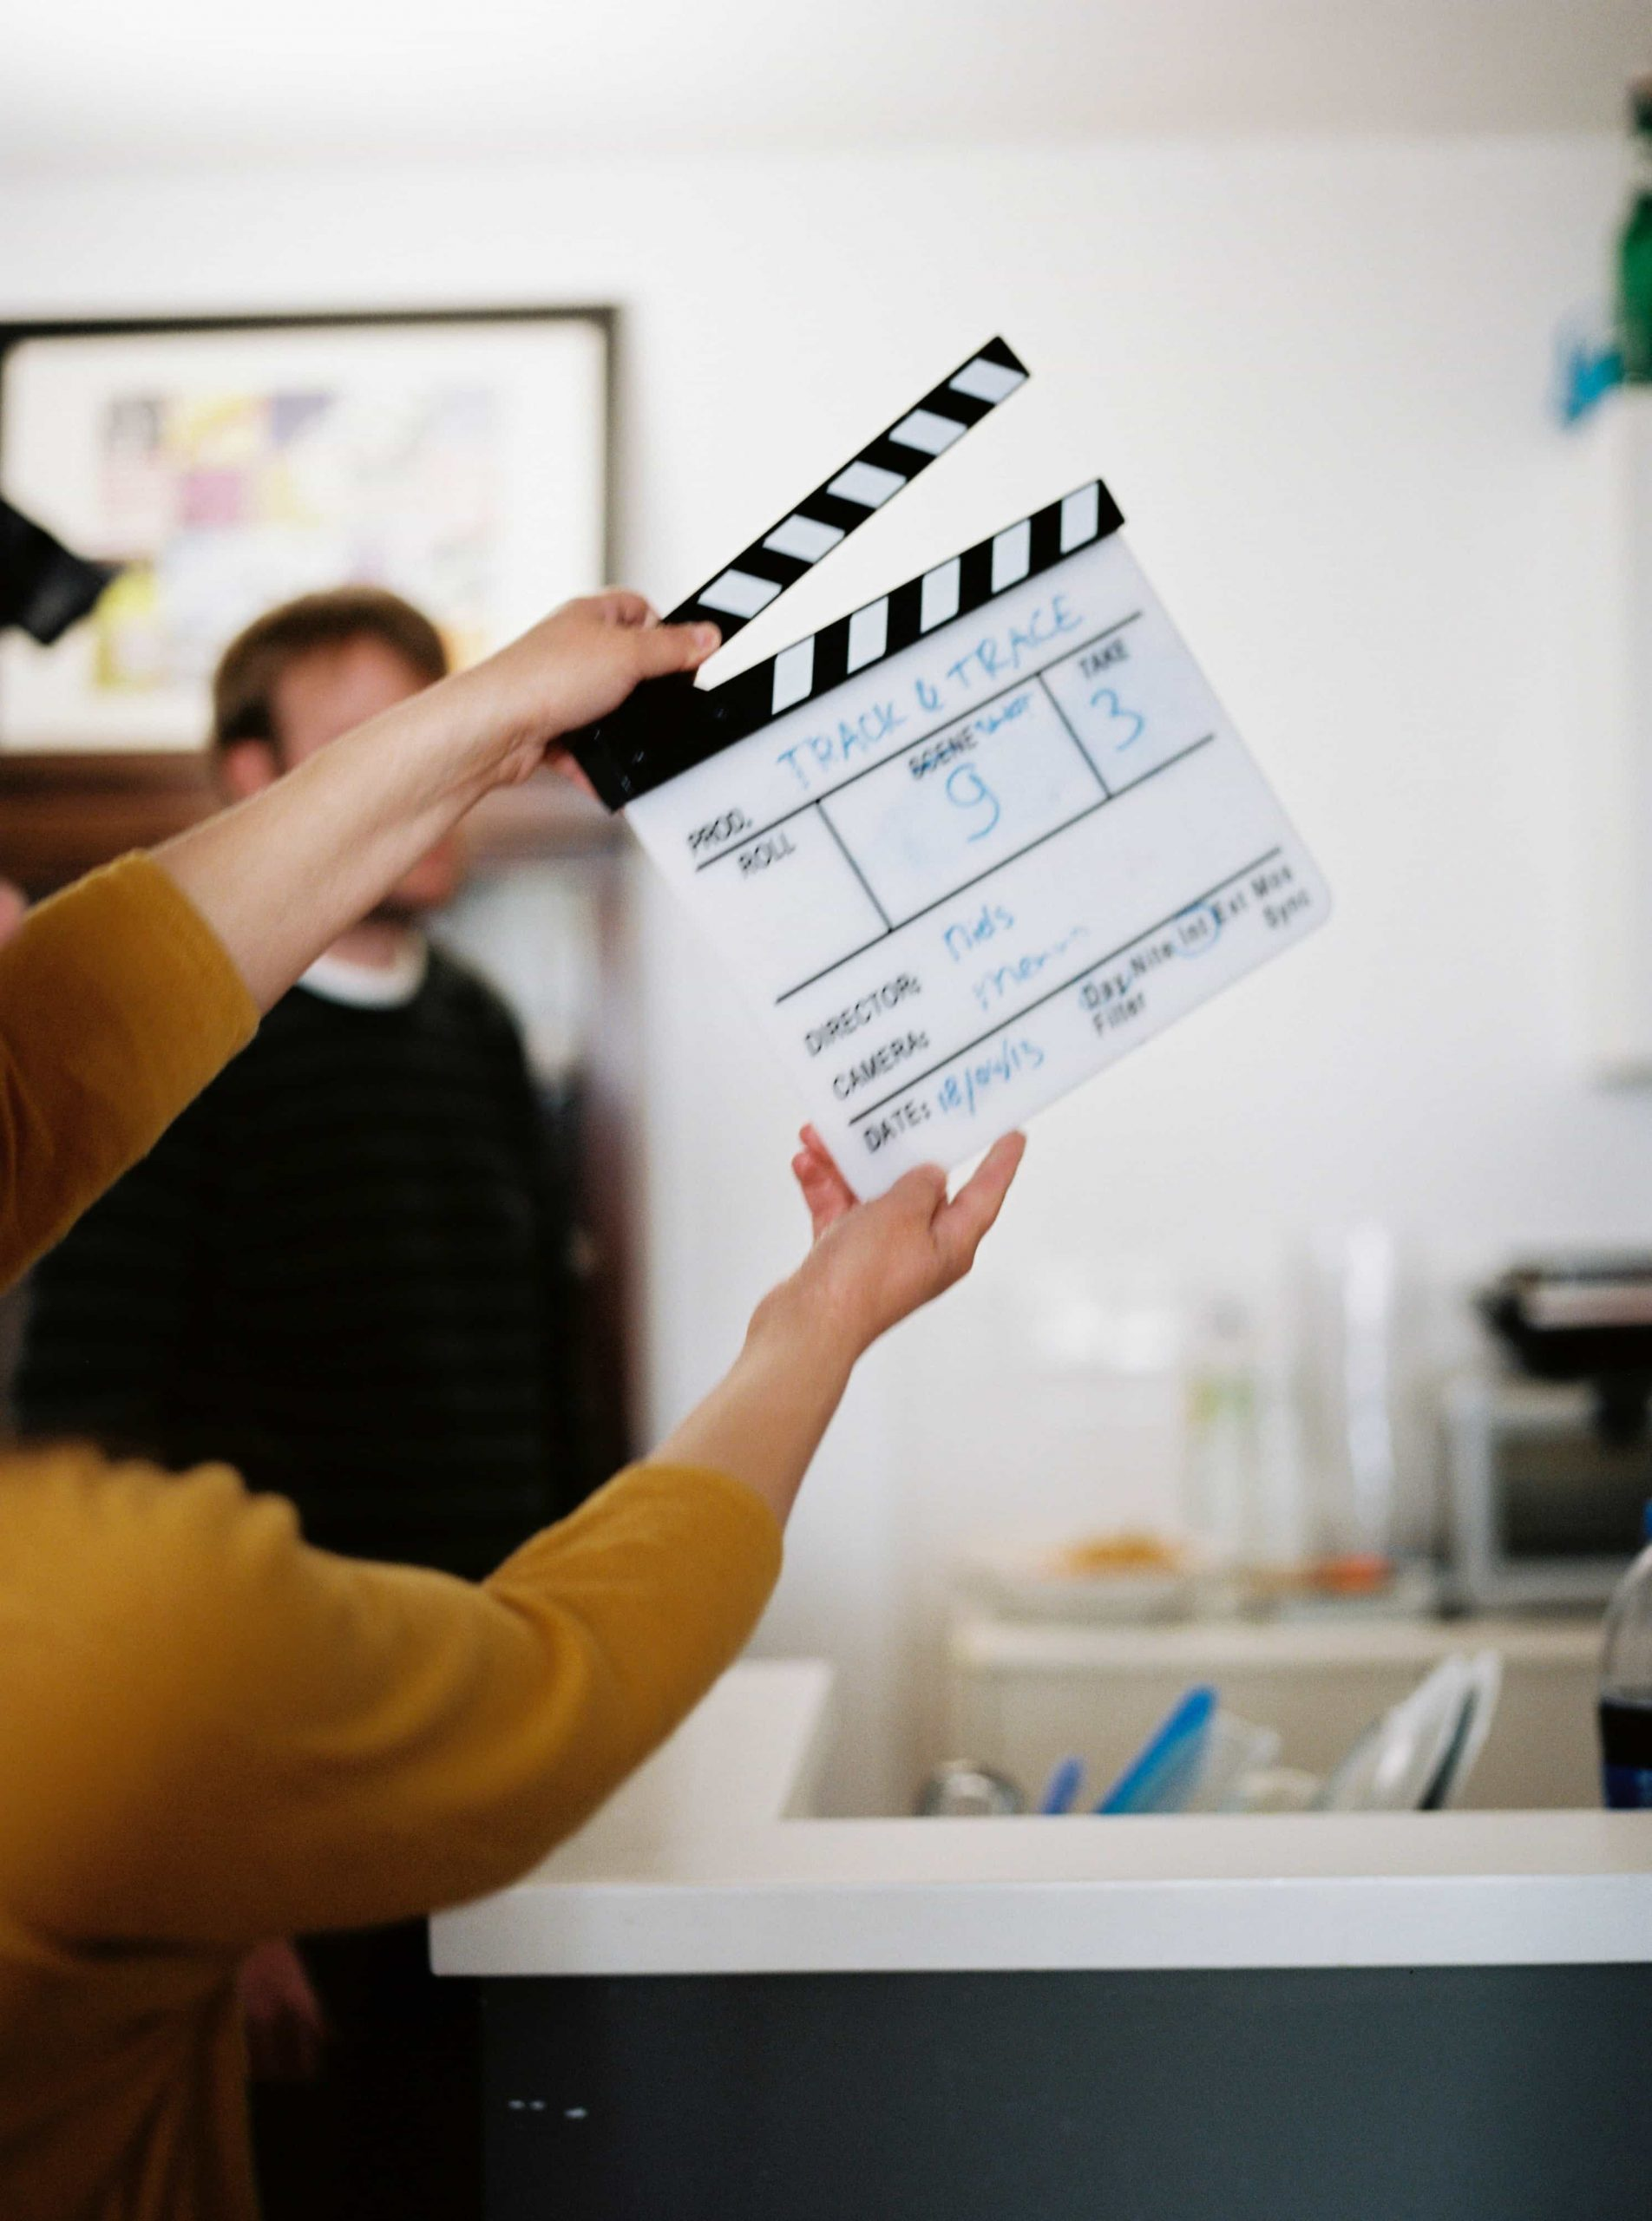 Styliste te huur: Styling van film-personages - oh yeah!